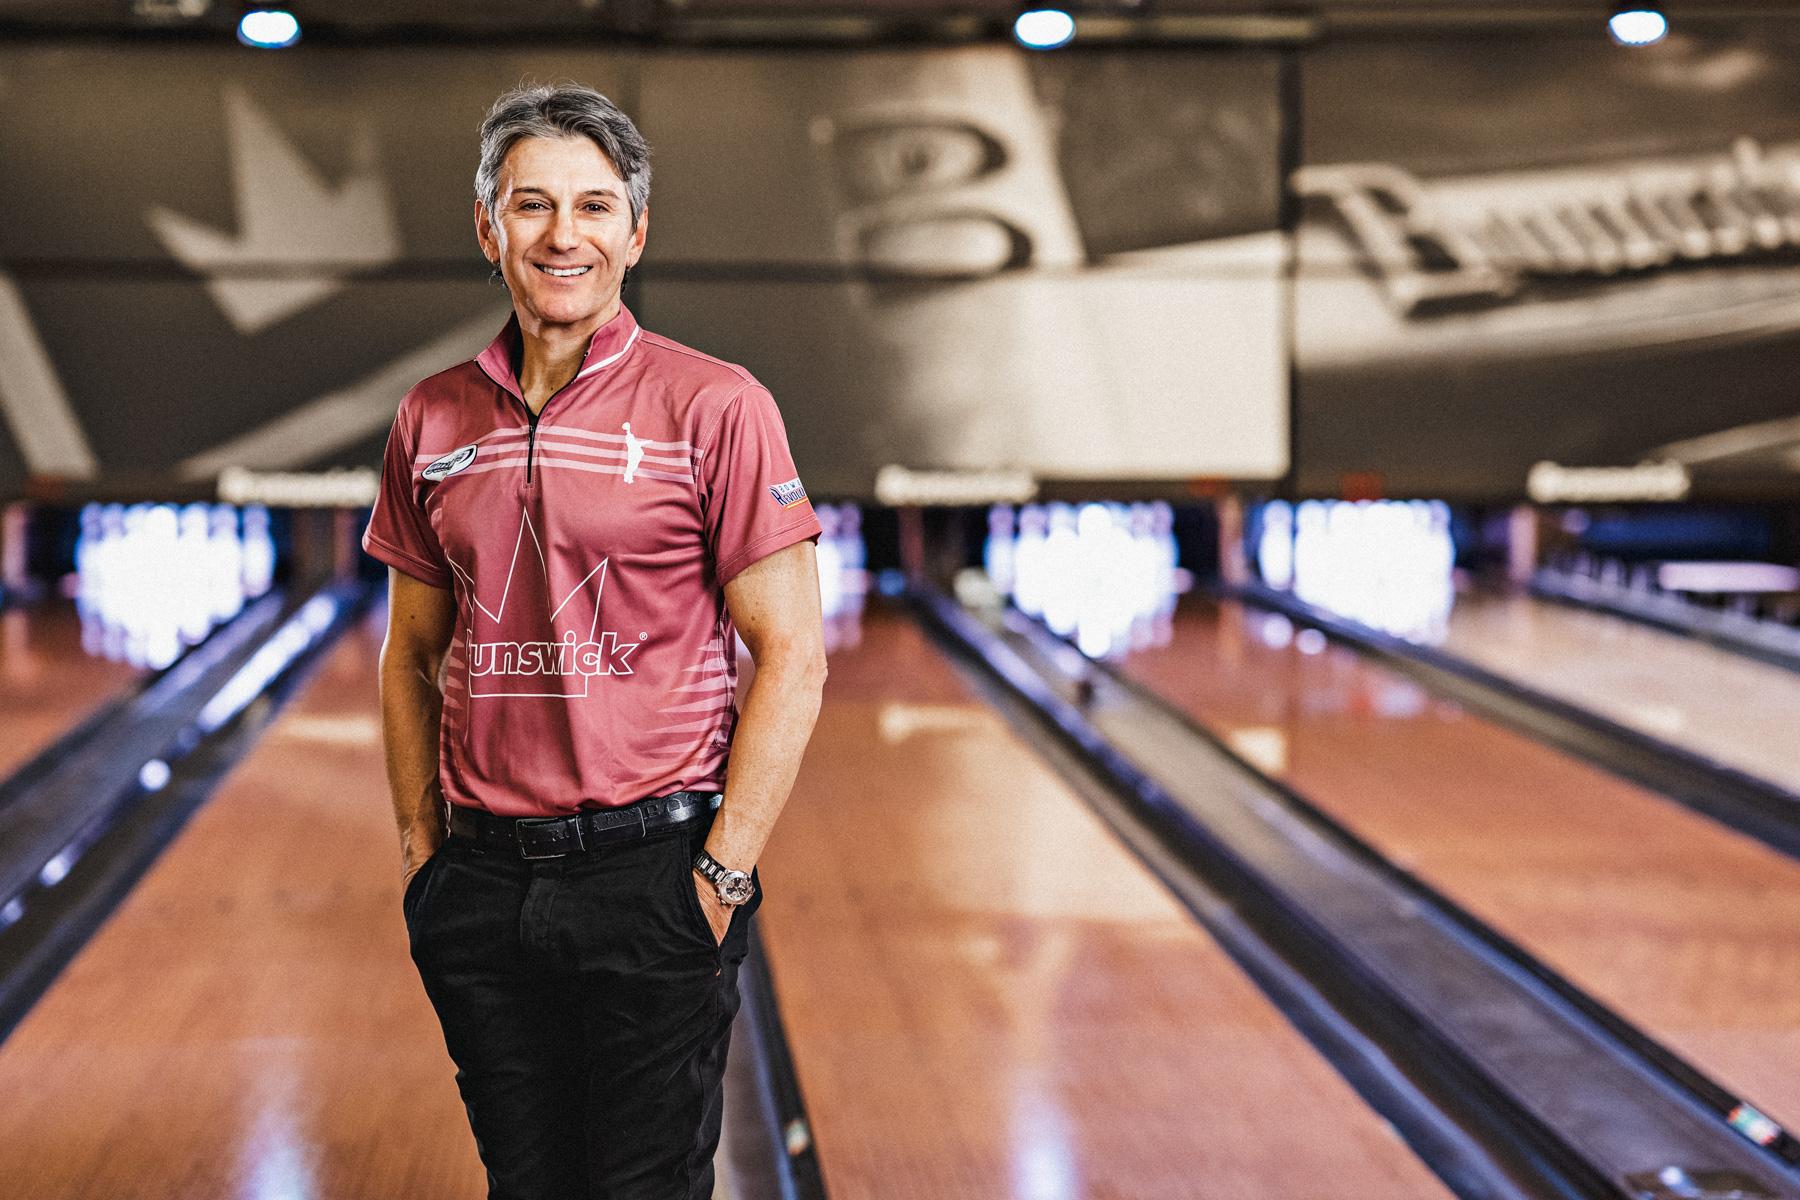 bowling-professional-photos-110.jpg